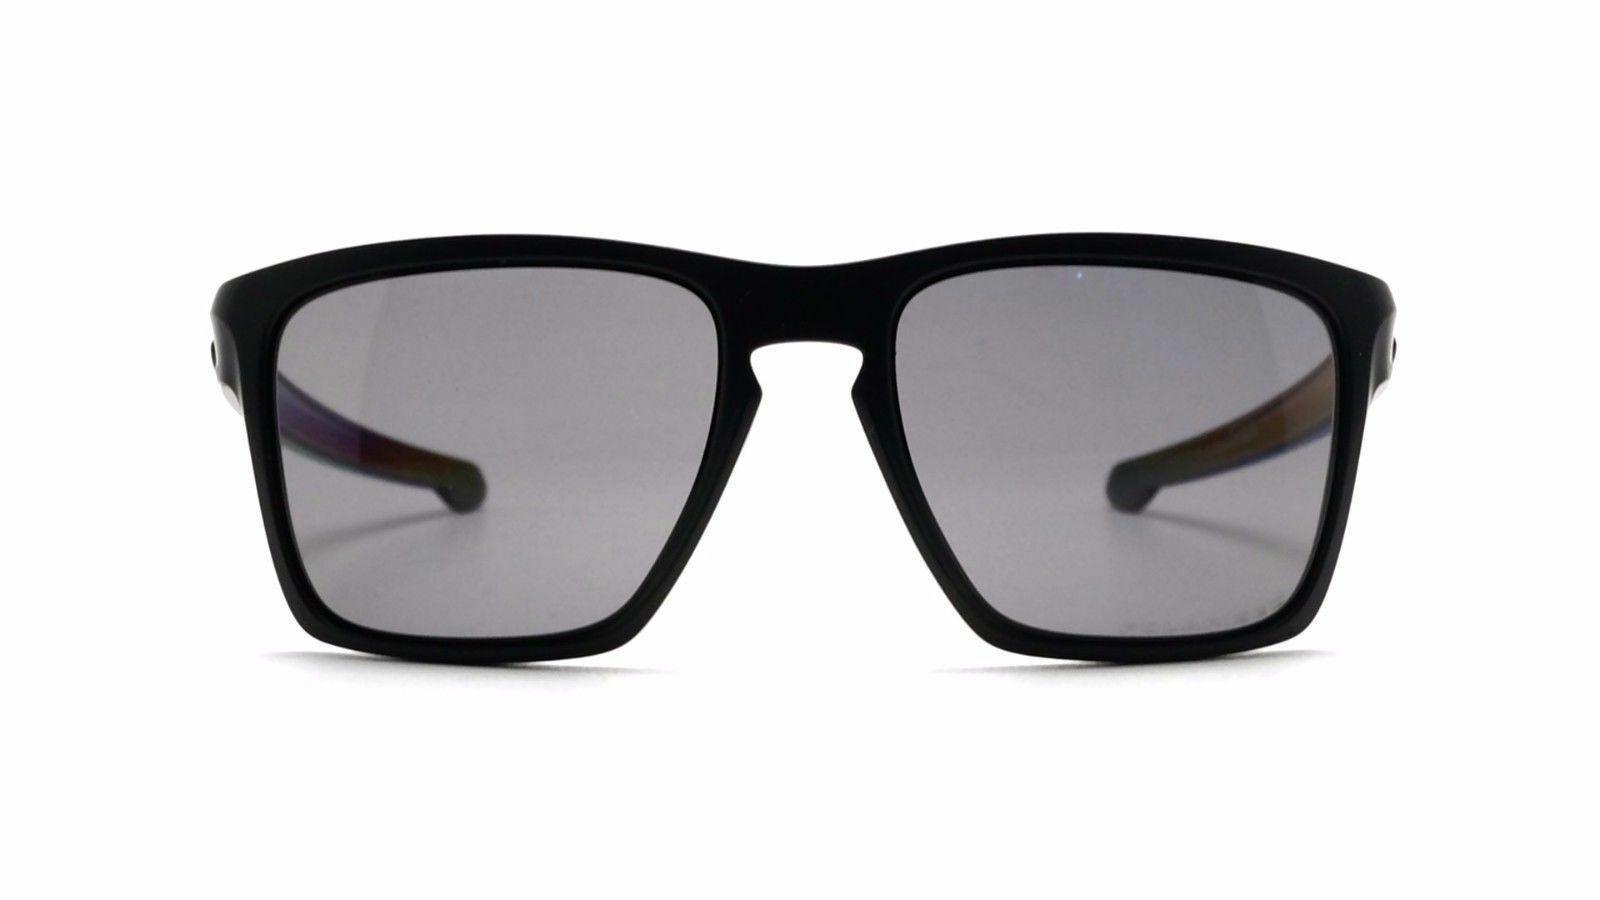 Oakley Sliver XL Polarized Sunglasses OO9341-01 Matte Black/Grey polarized NEW